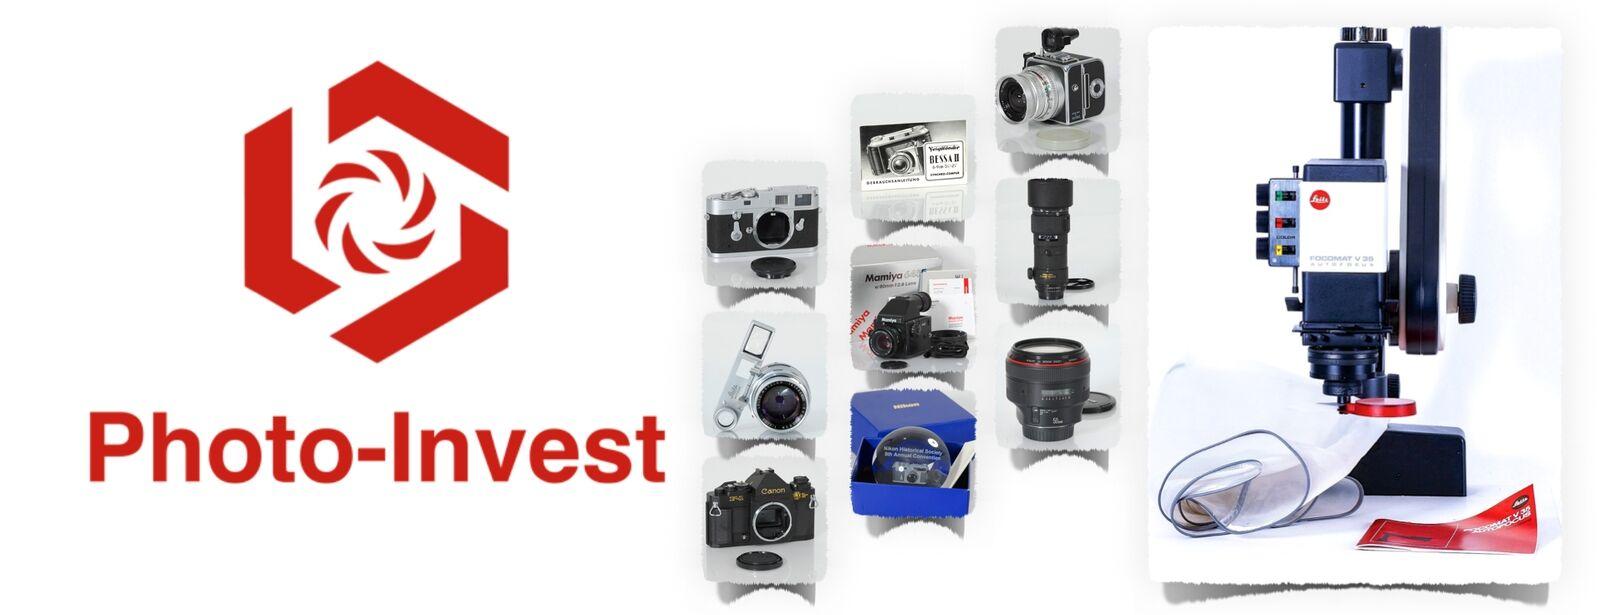 Photo-Invest